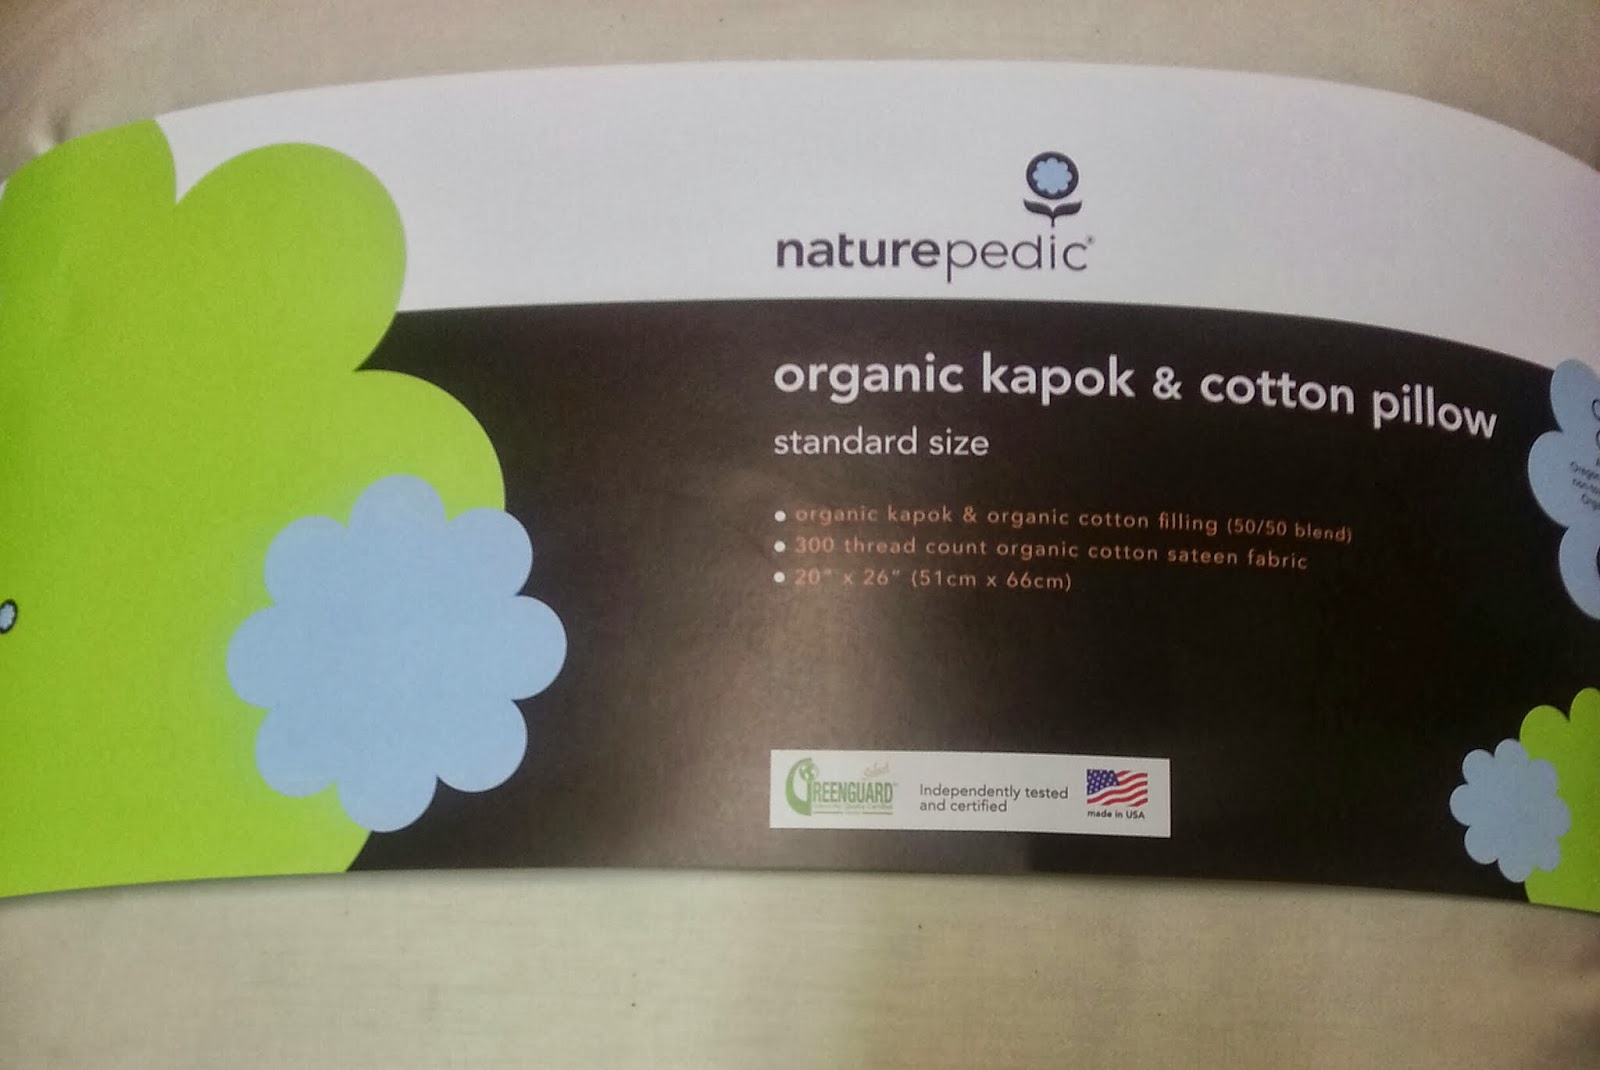 Naturepedic Organic Cotton Waterproof Crib Pad Fitted 69 Waterproof Liners For Crib | Home Improvement